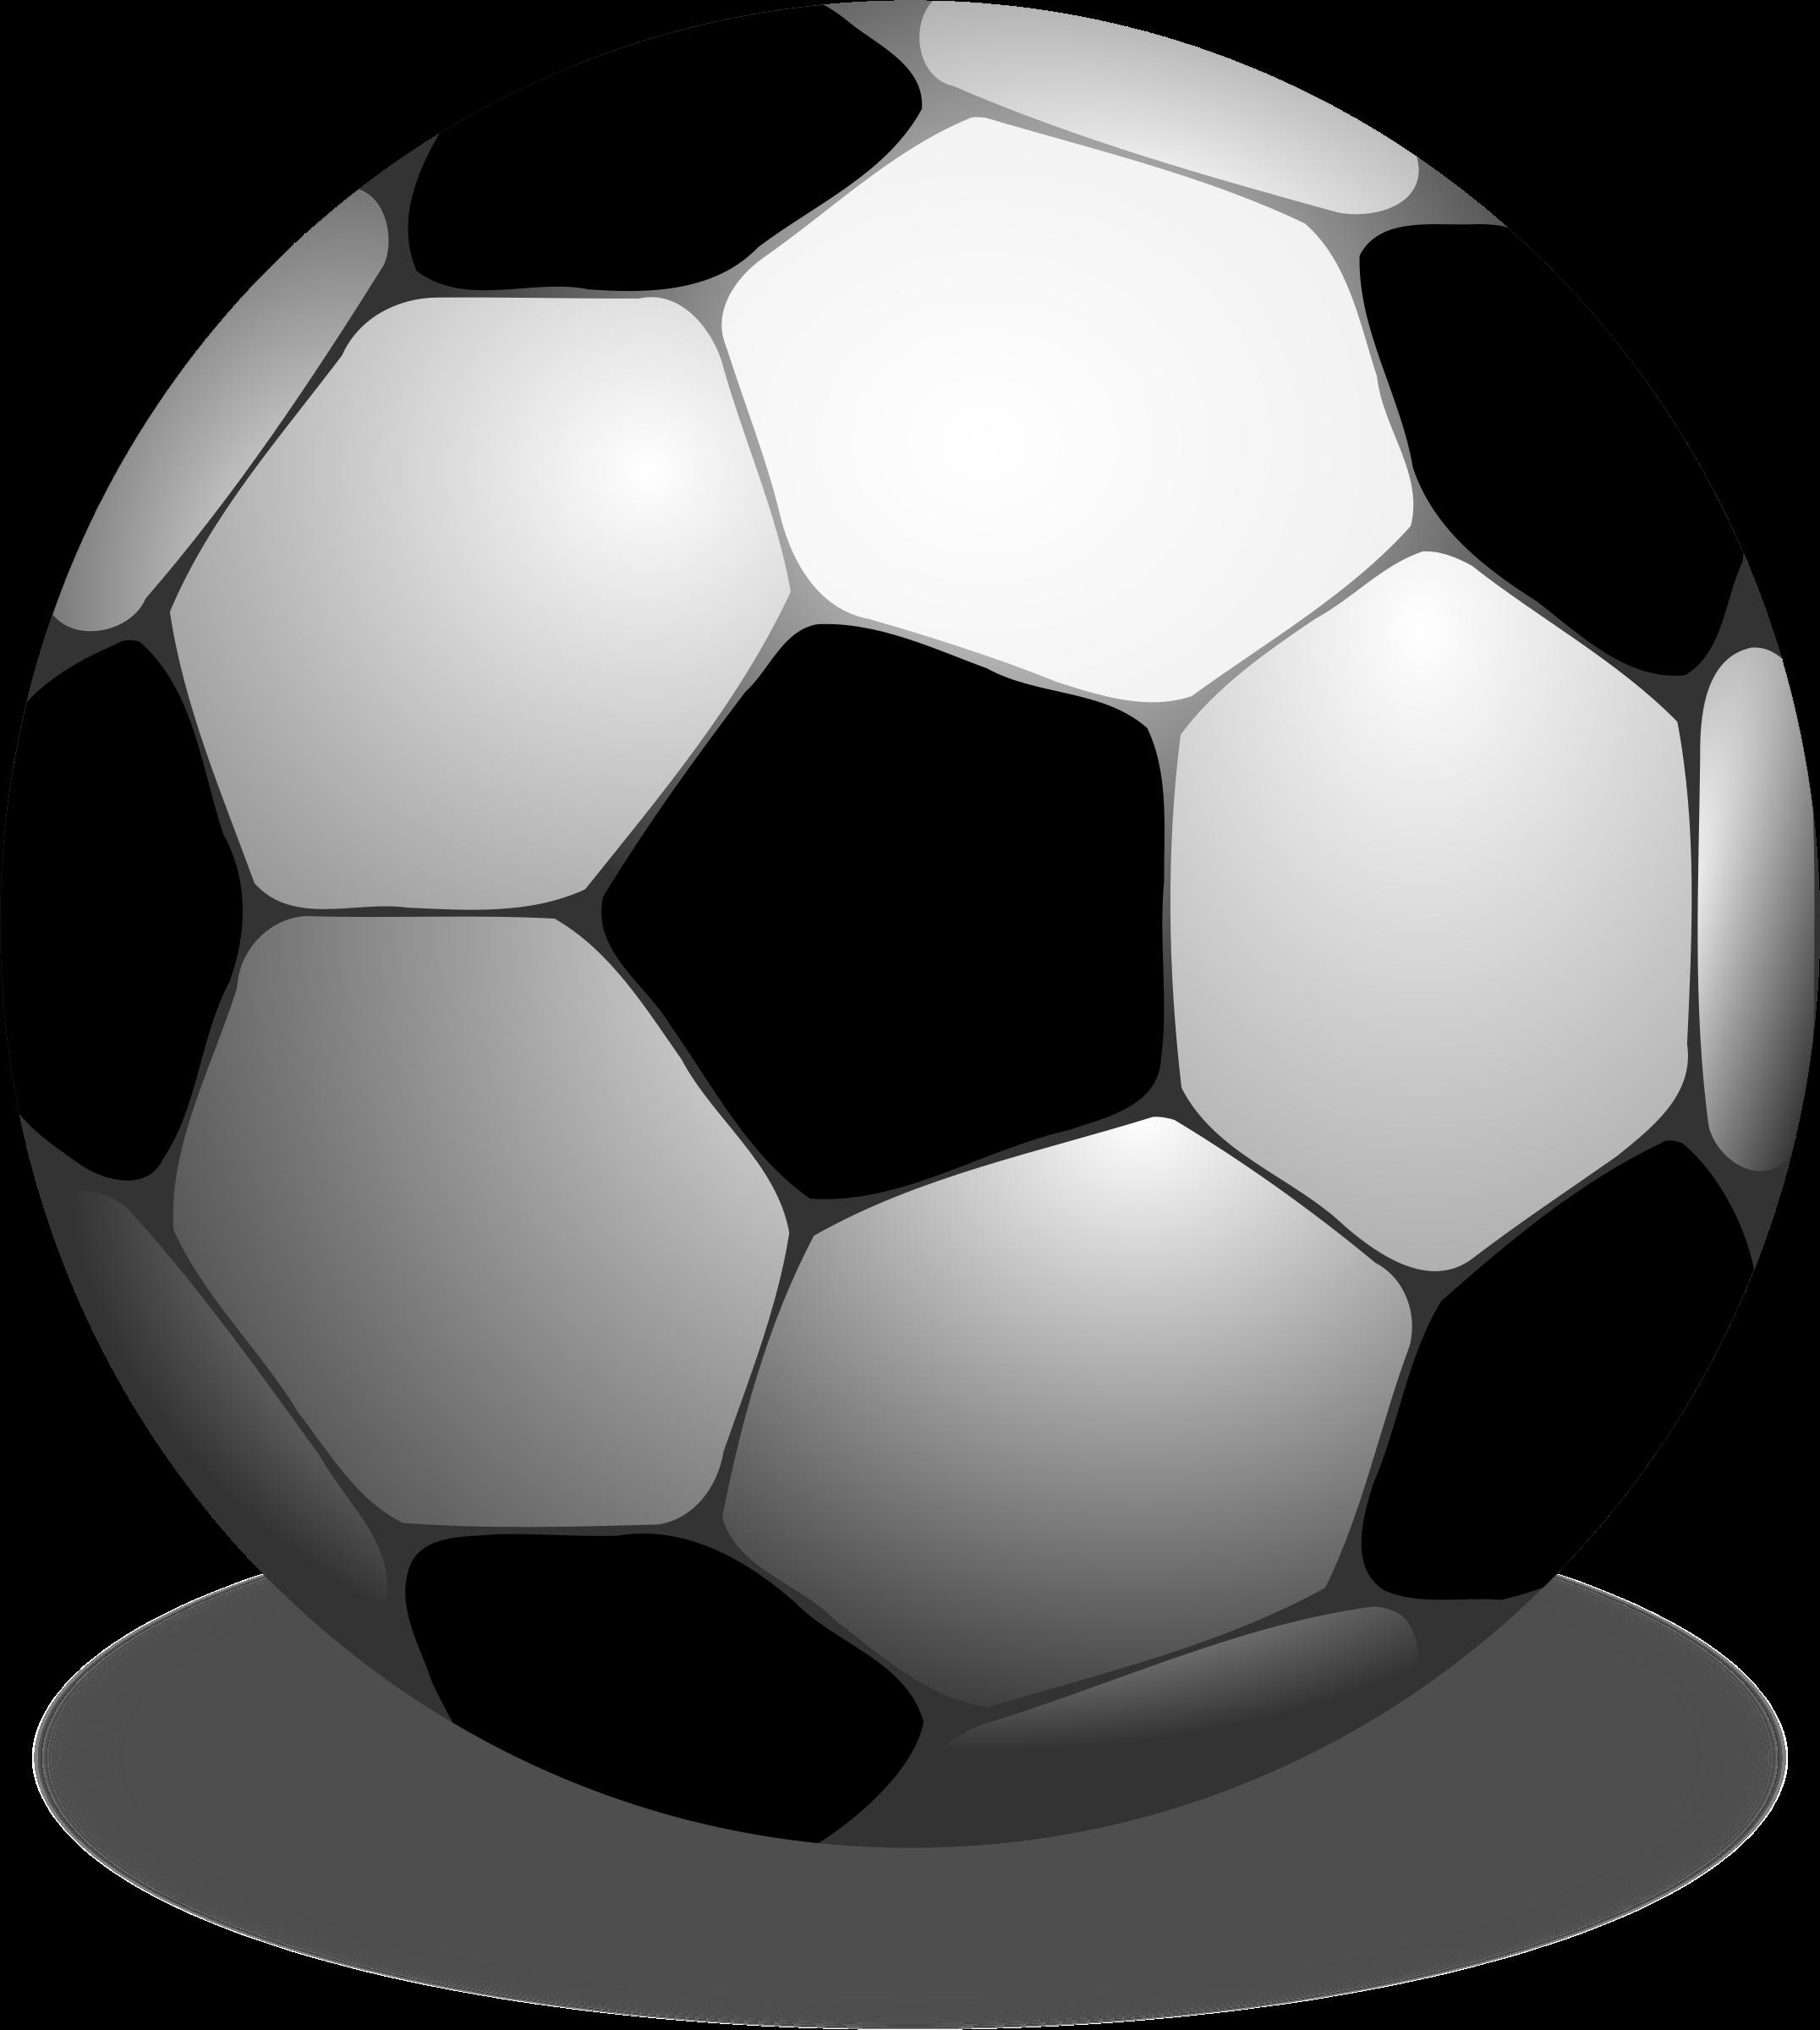 Clipart football printable. Futbolo kamuolys big image